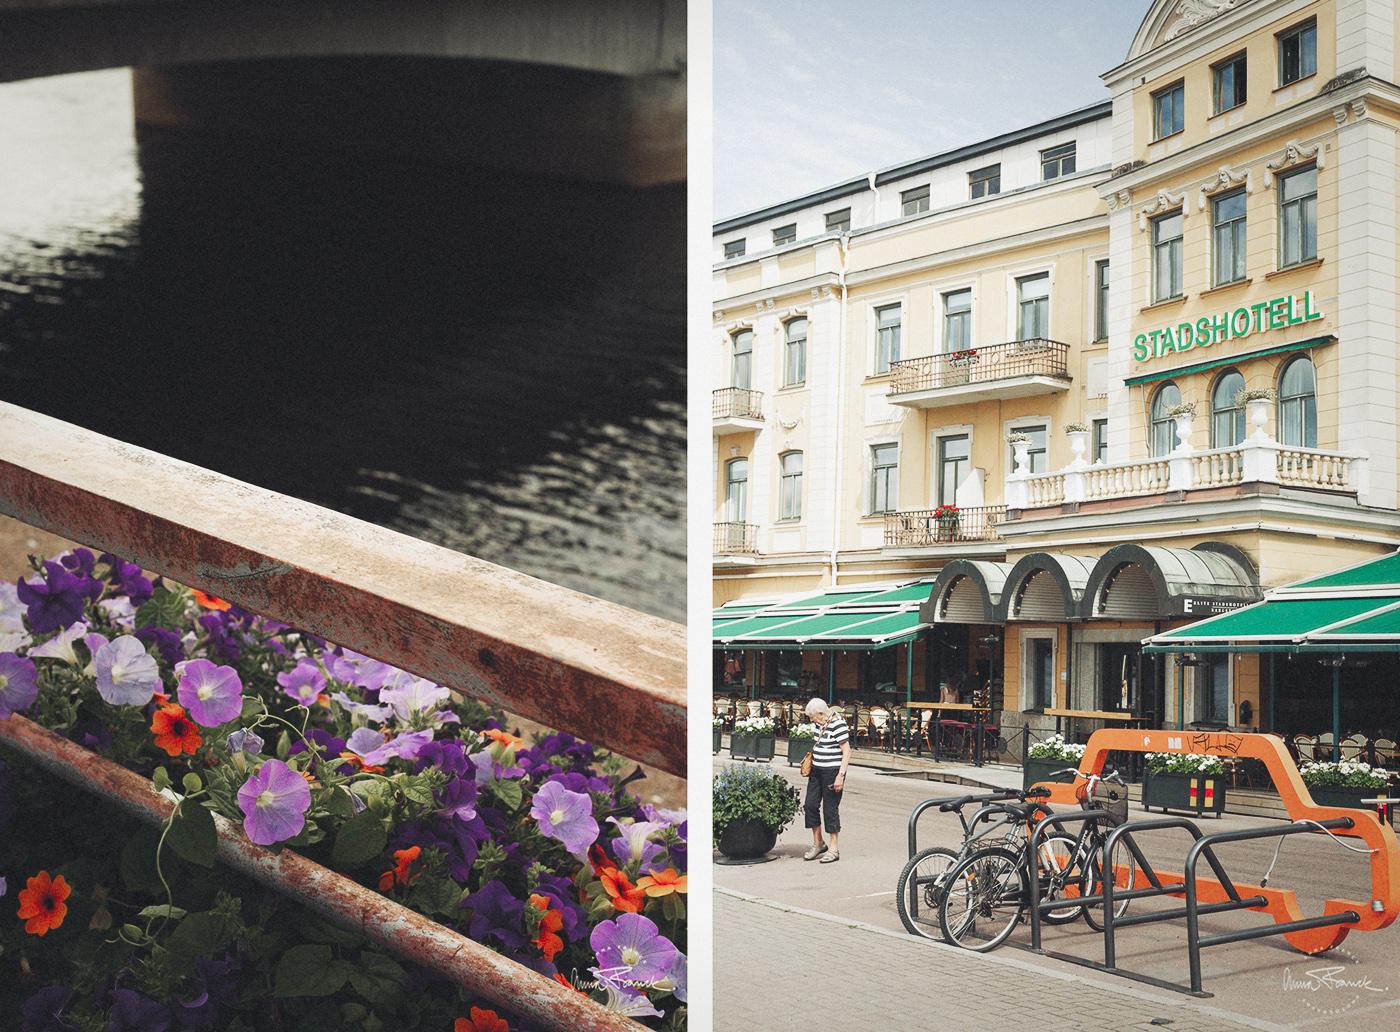 karlstad, anna, franck, photography, summer, sommar, bko, statues, statyer, museum, blommor, turism, tourist